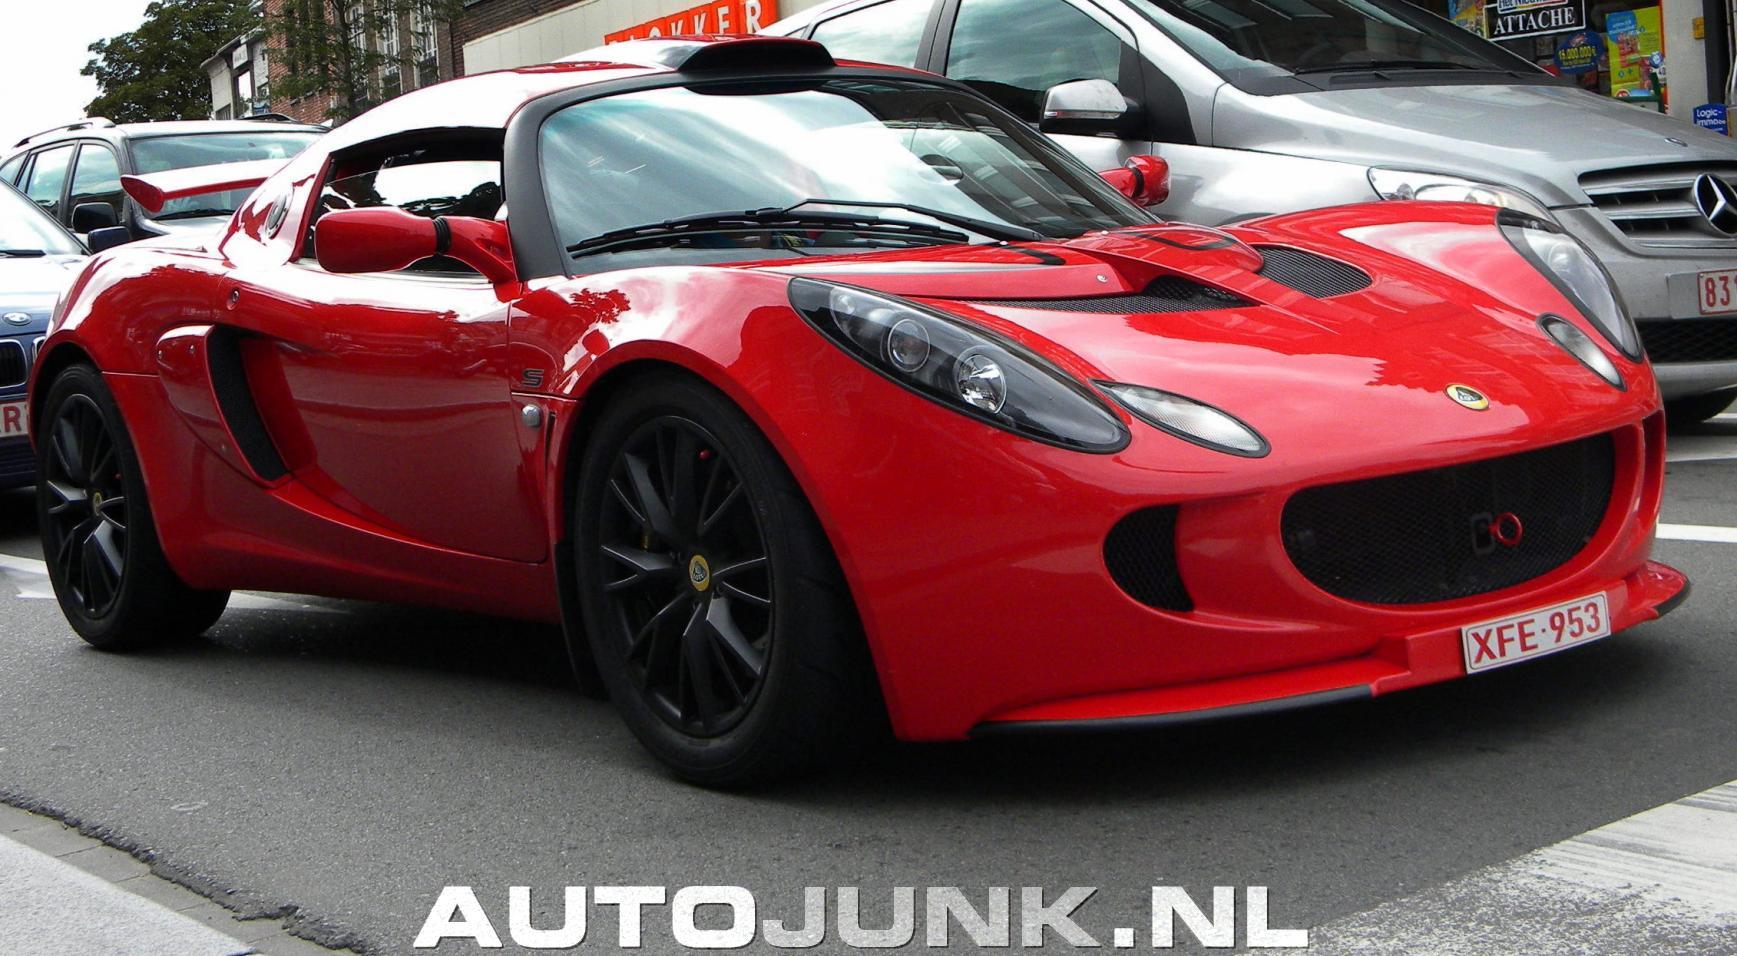 Lotus Exige S2 foto's » Autojunk.nl (142332)